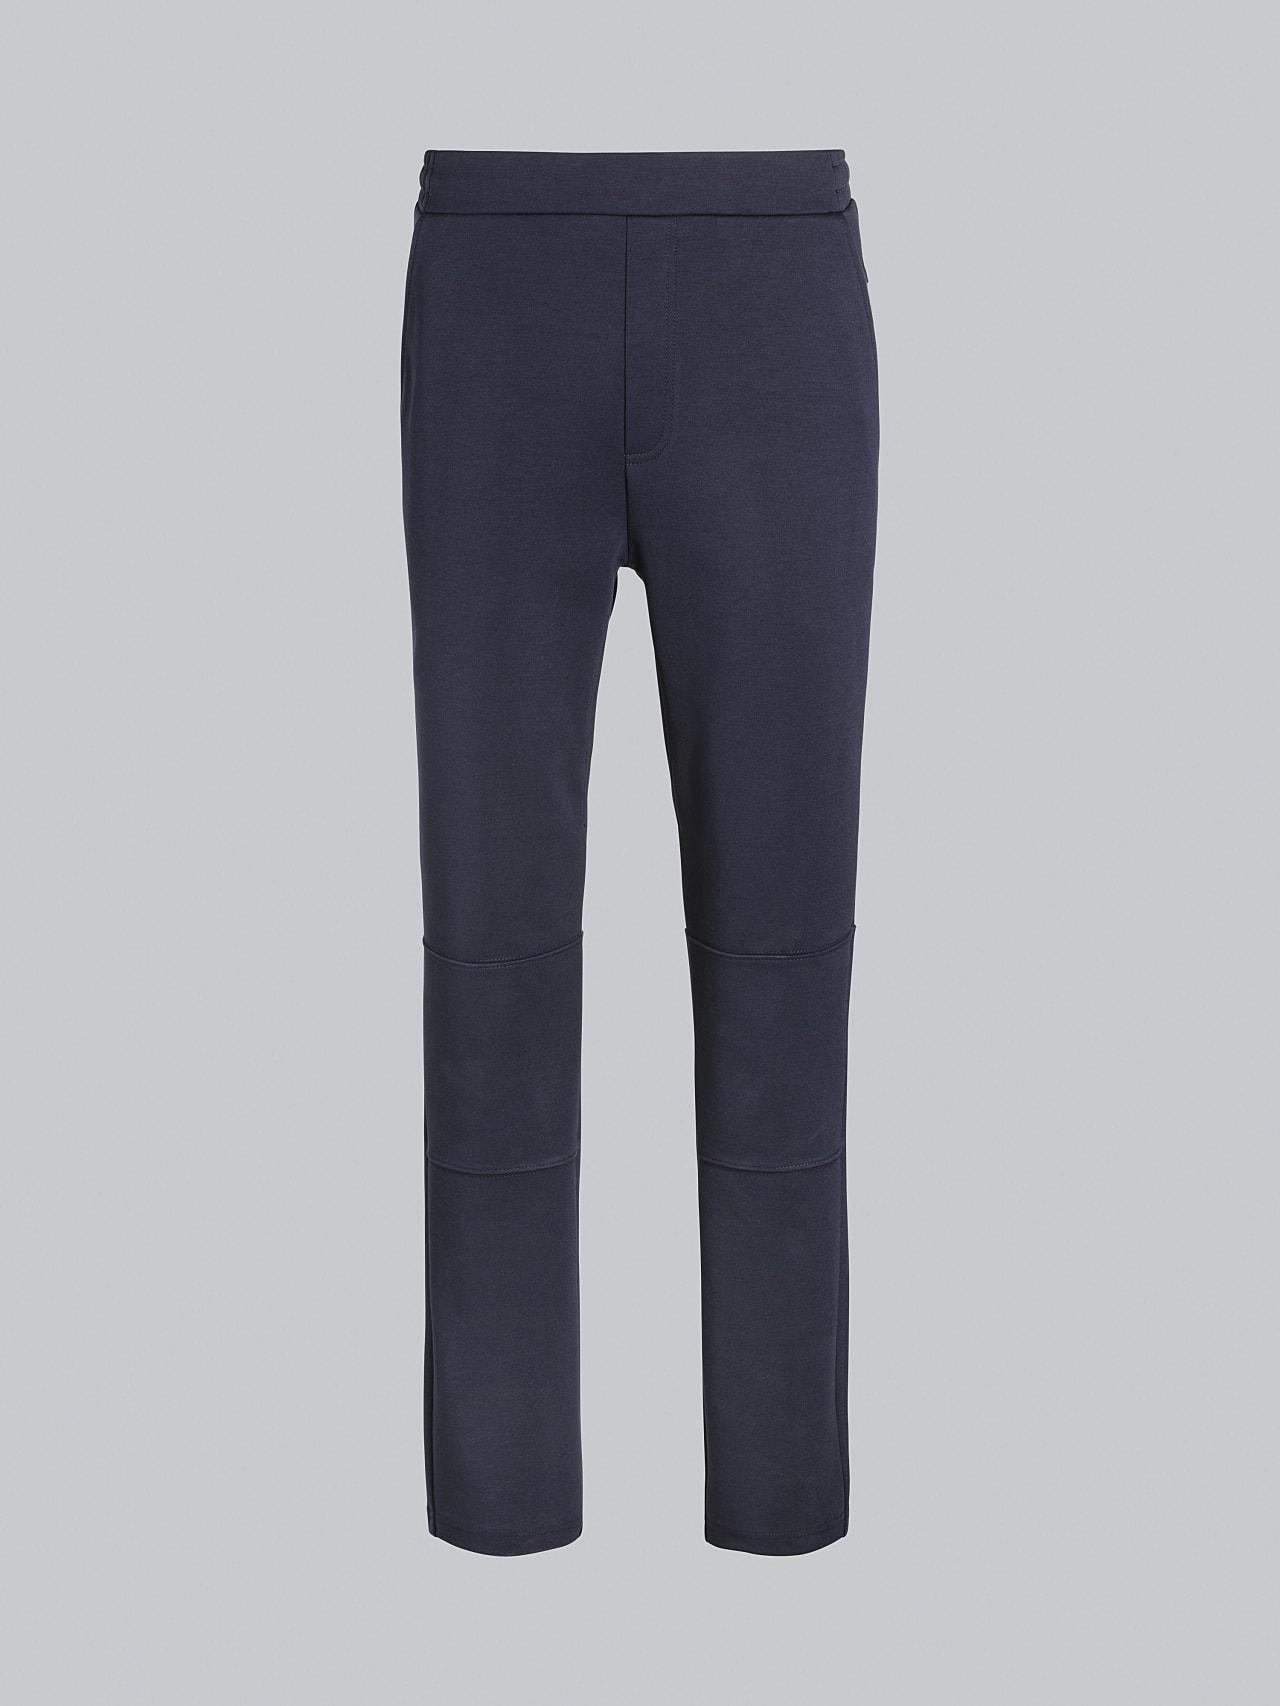 PRYK V7.Y5.02 Premium Sweatpants navy Back Alpha Tauri